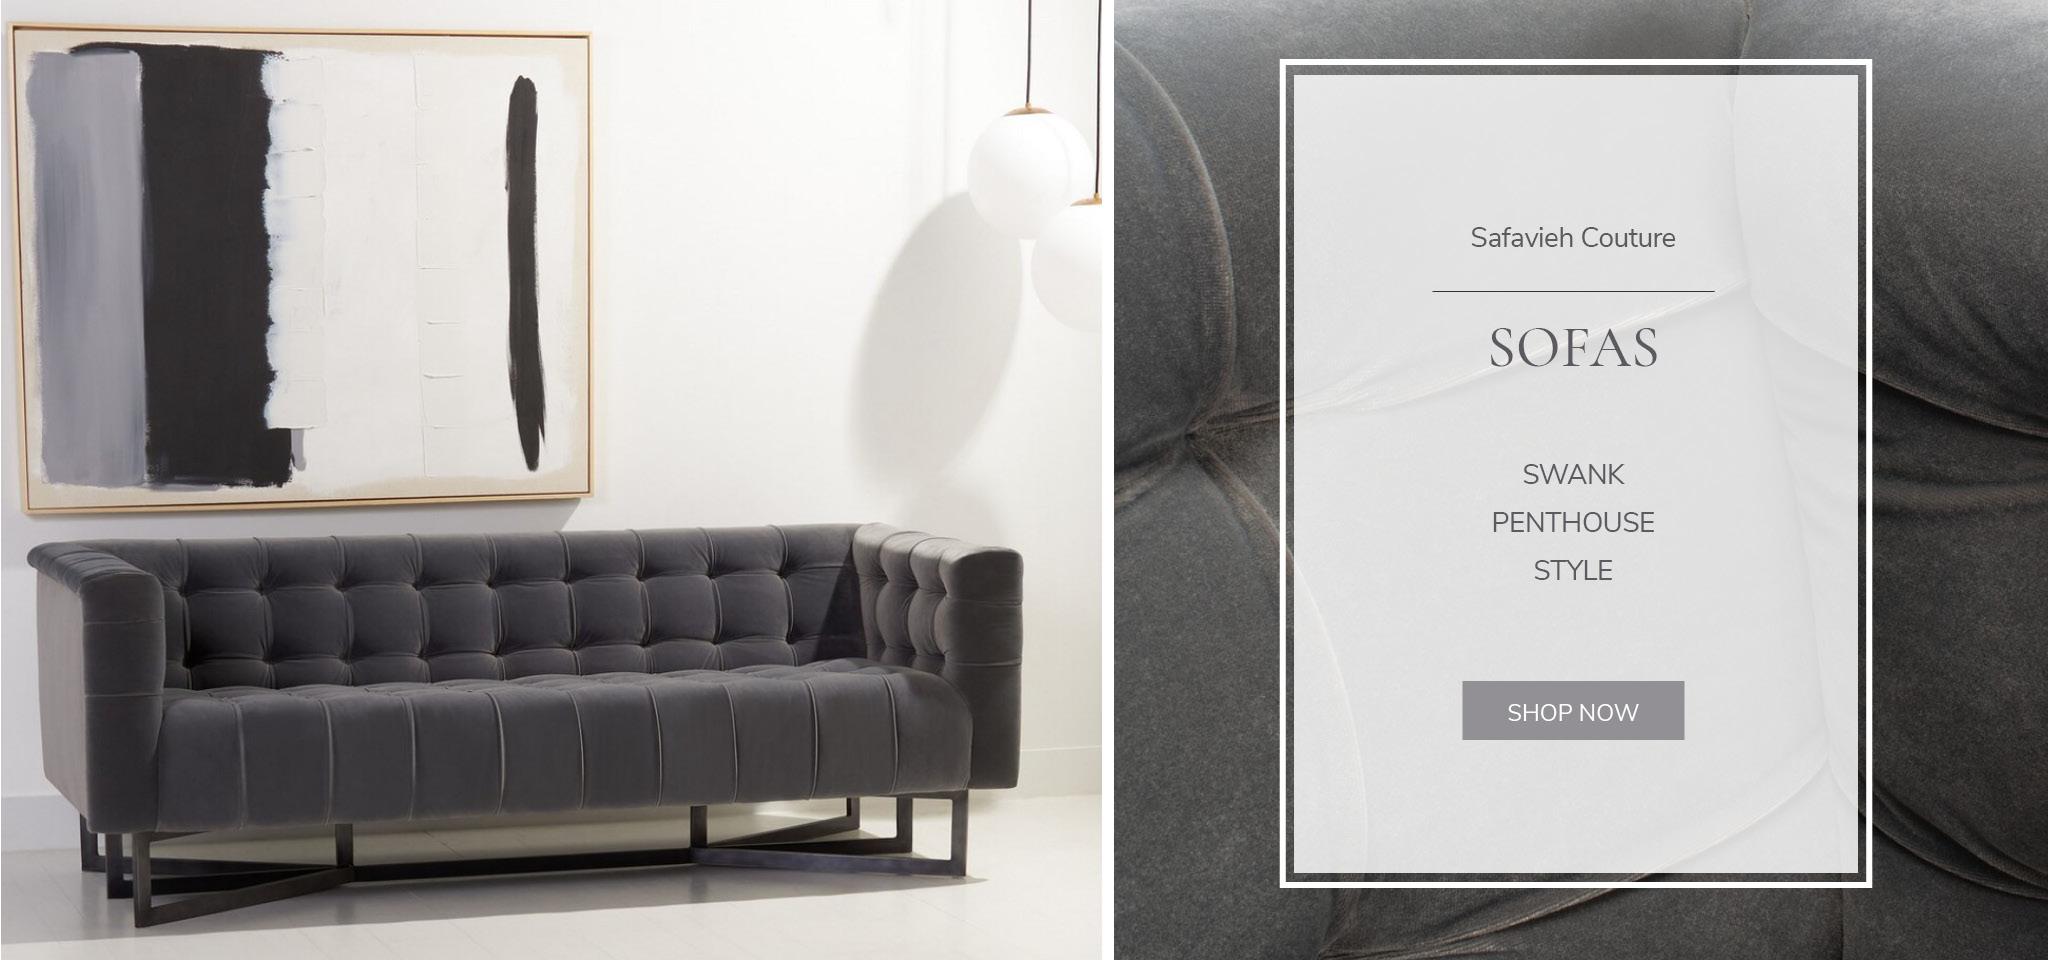 Safavieh Couture - Sofas